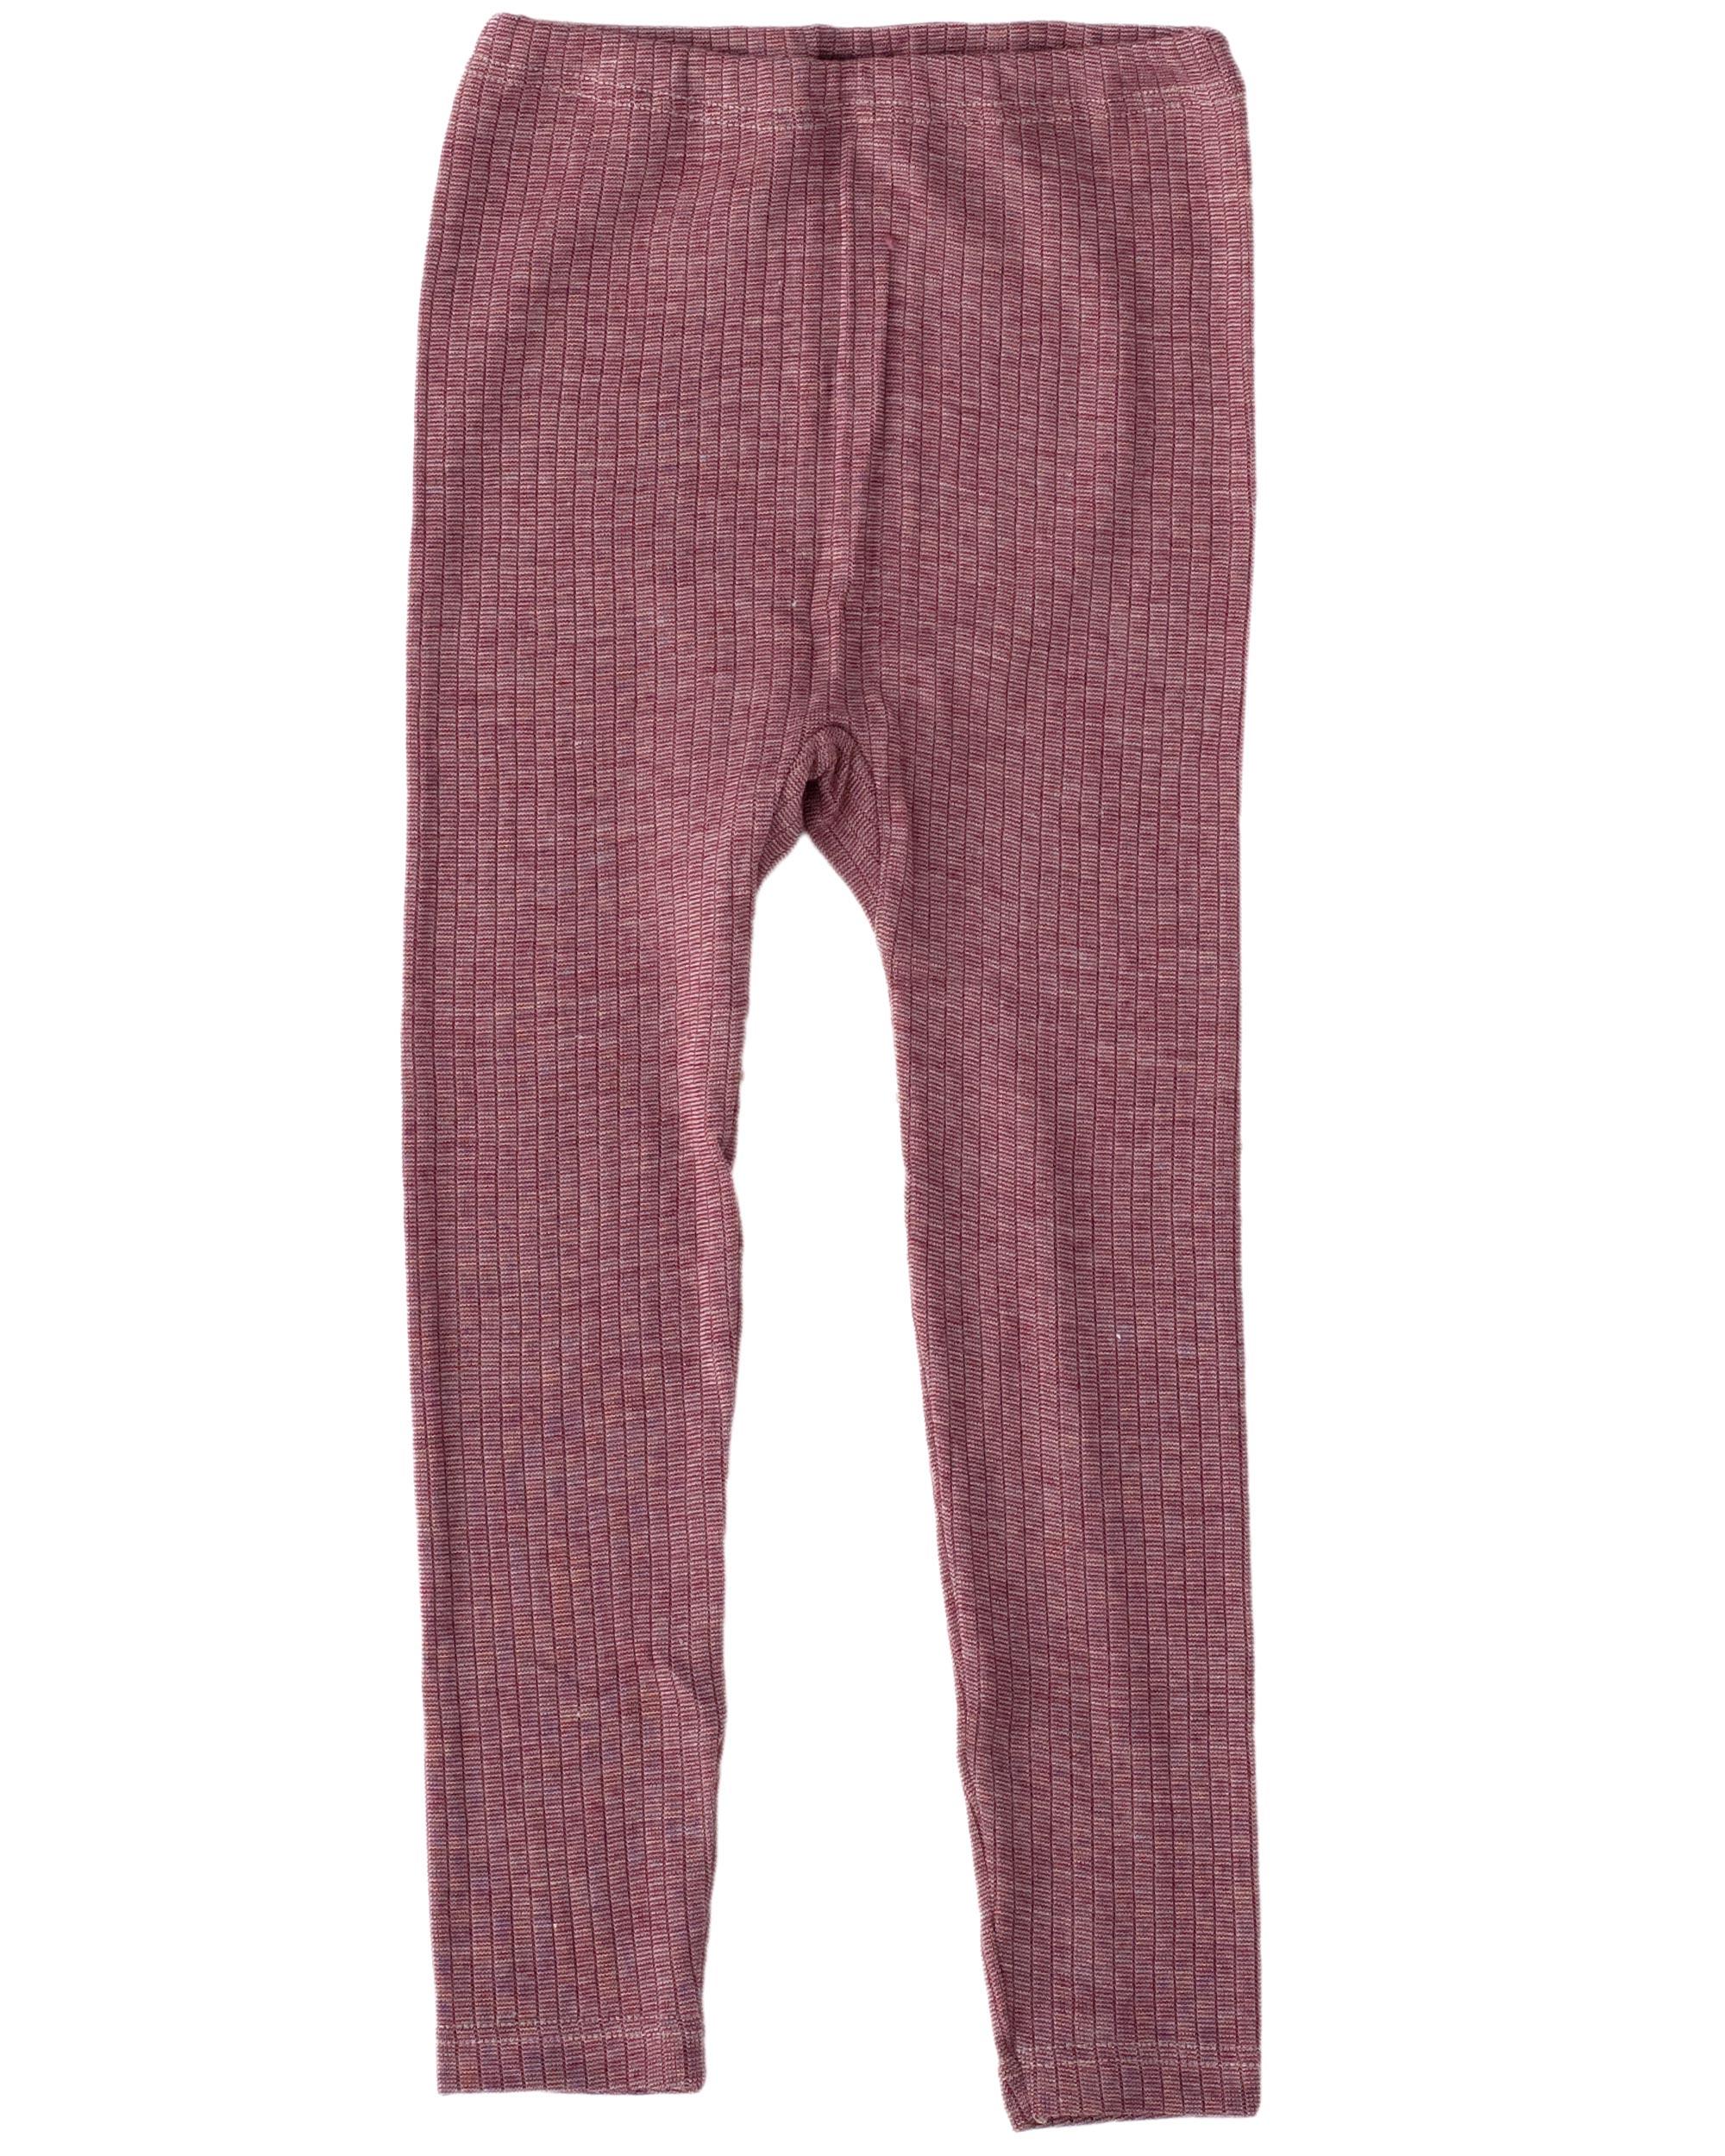 8aa67144e853 Cosilana, Kinder Leggings / lange Unterhose, 45% Baumwolle, 35% Wolle, 20%  Seide